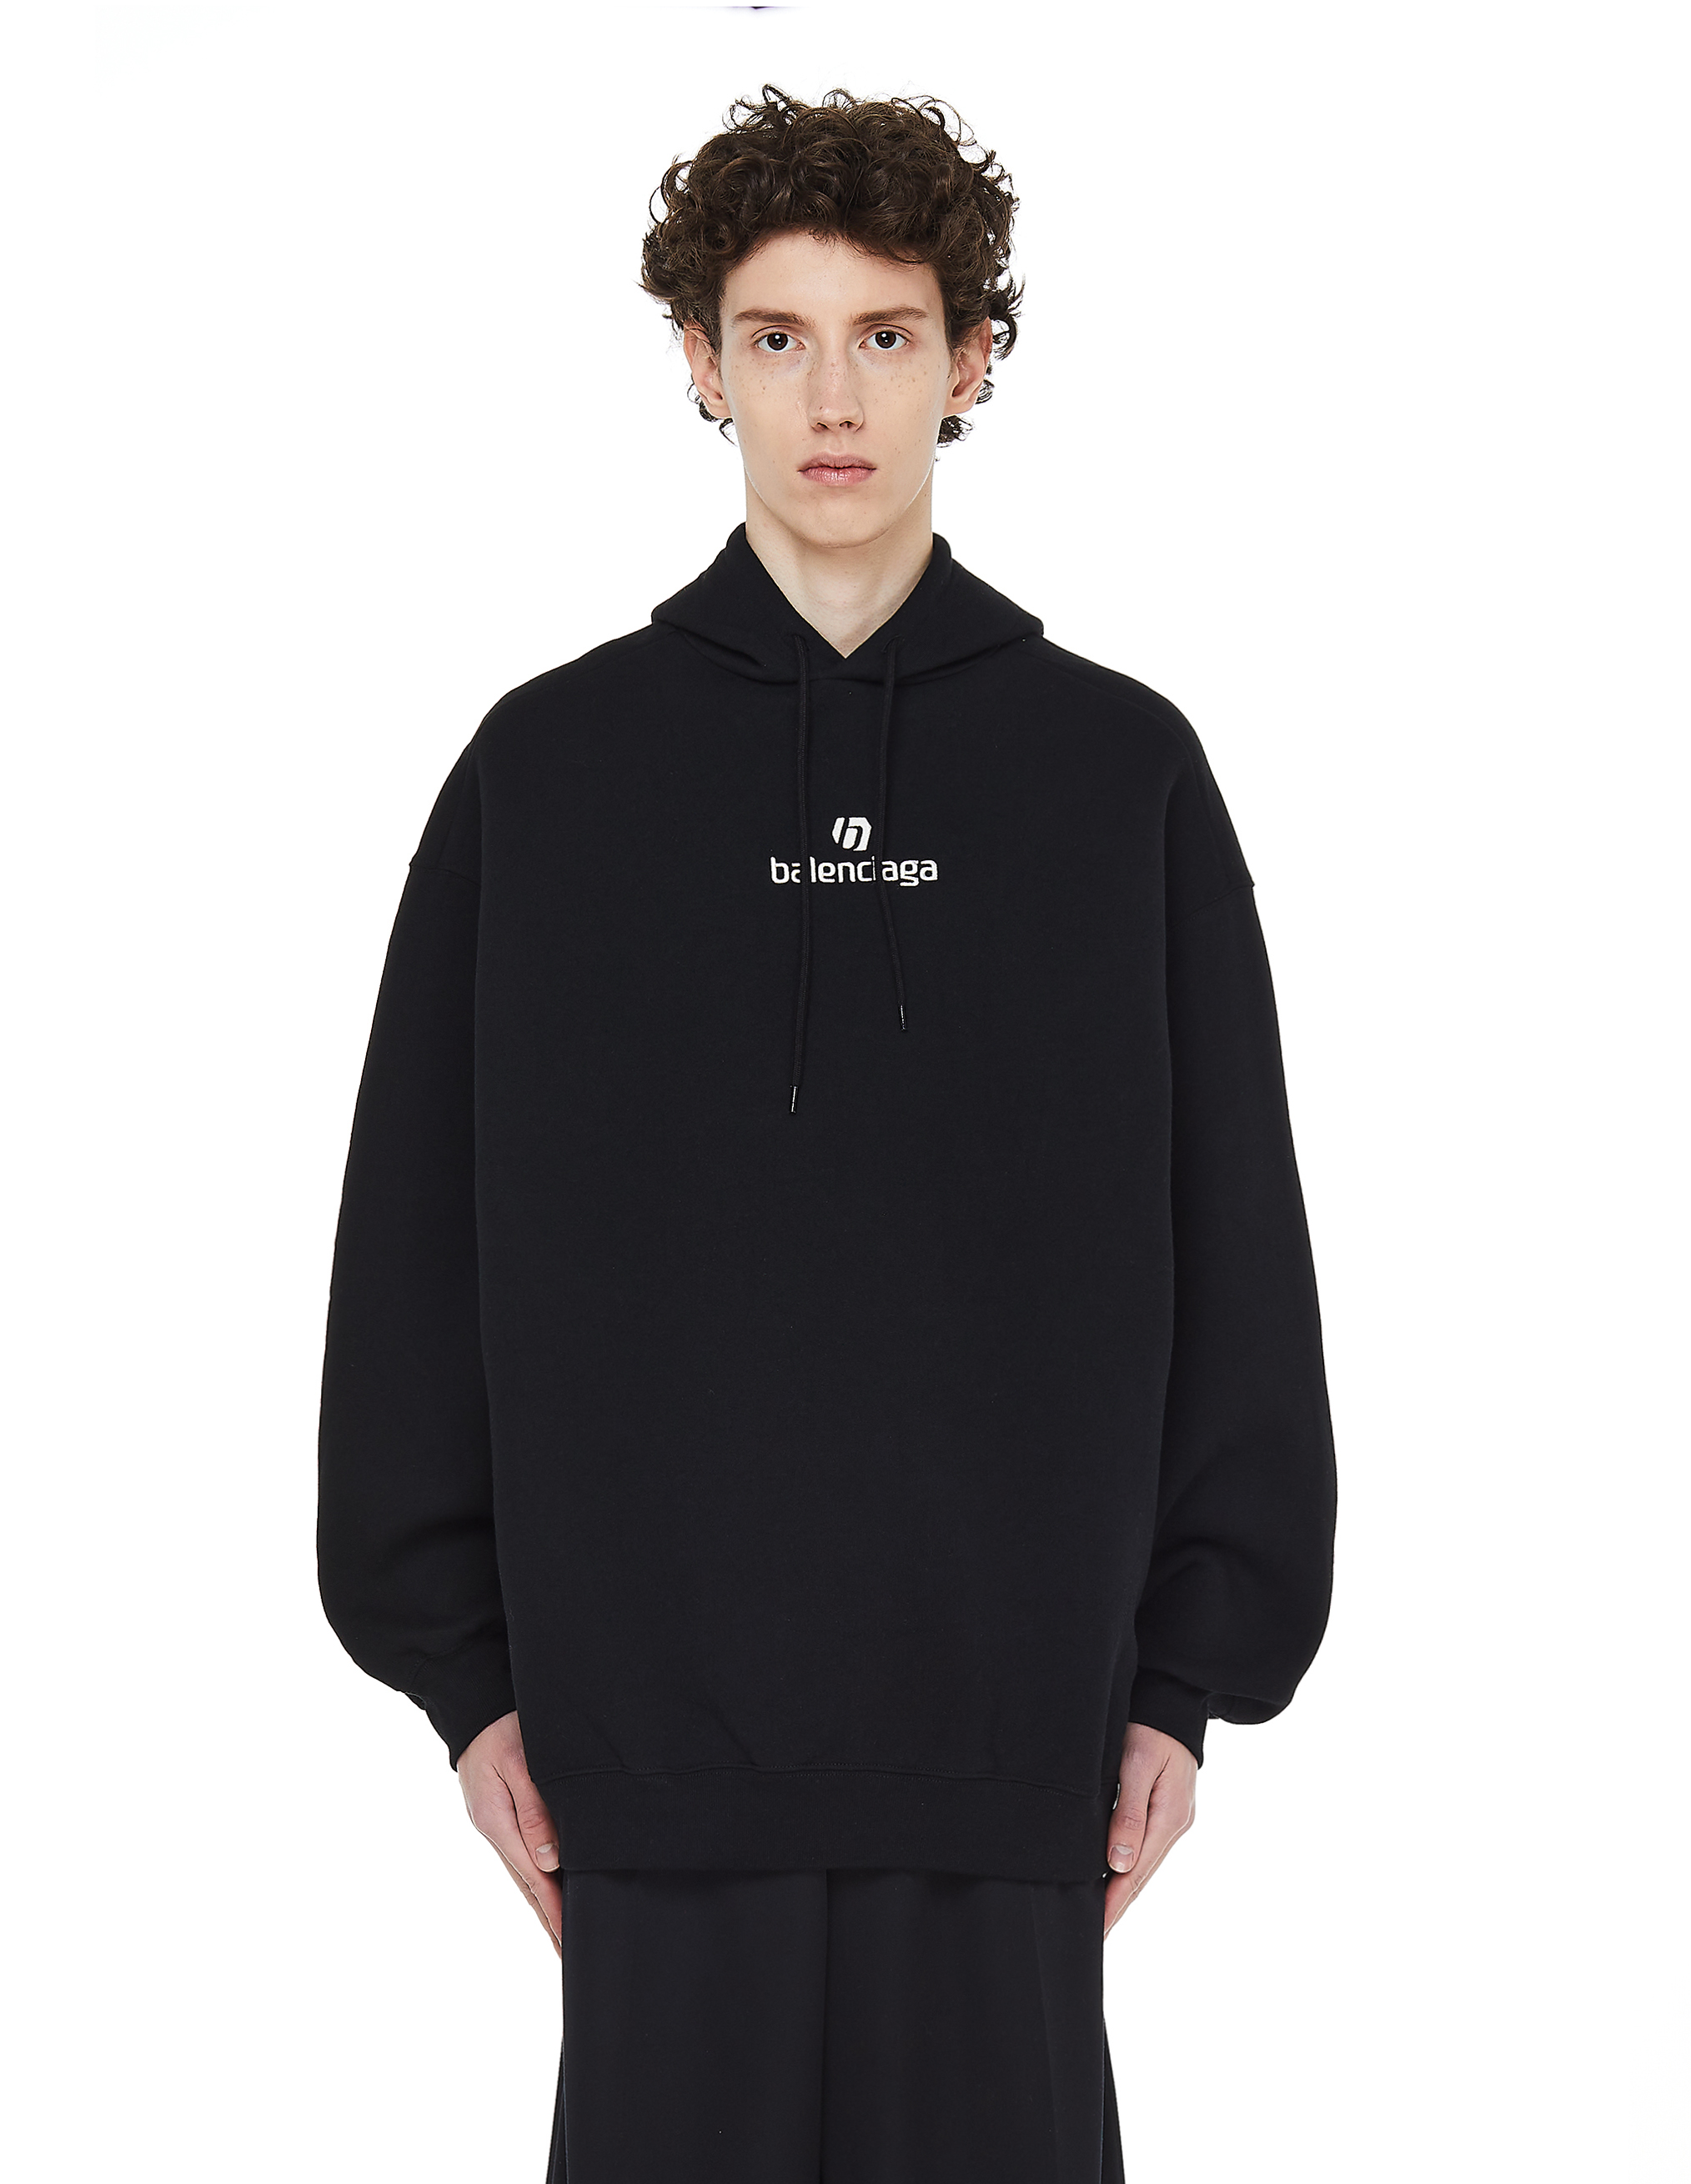 Balenciaga Black Logo Printed Hoodie